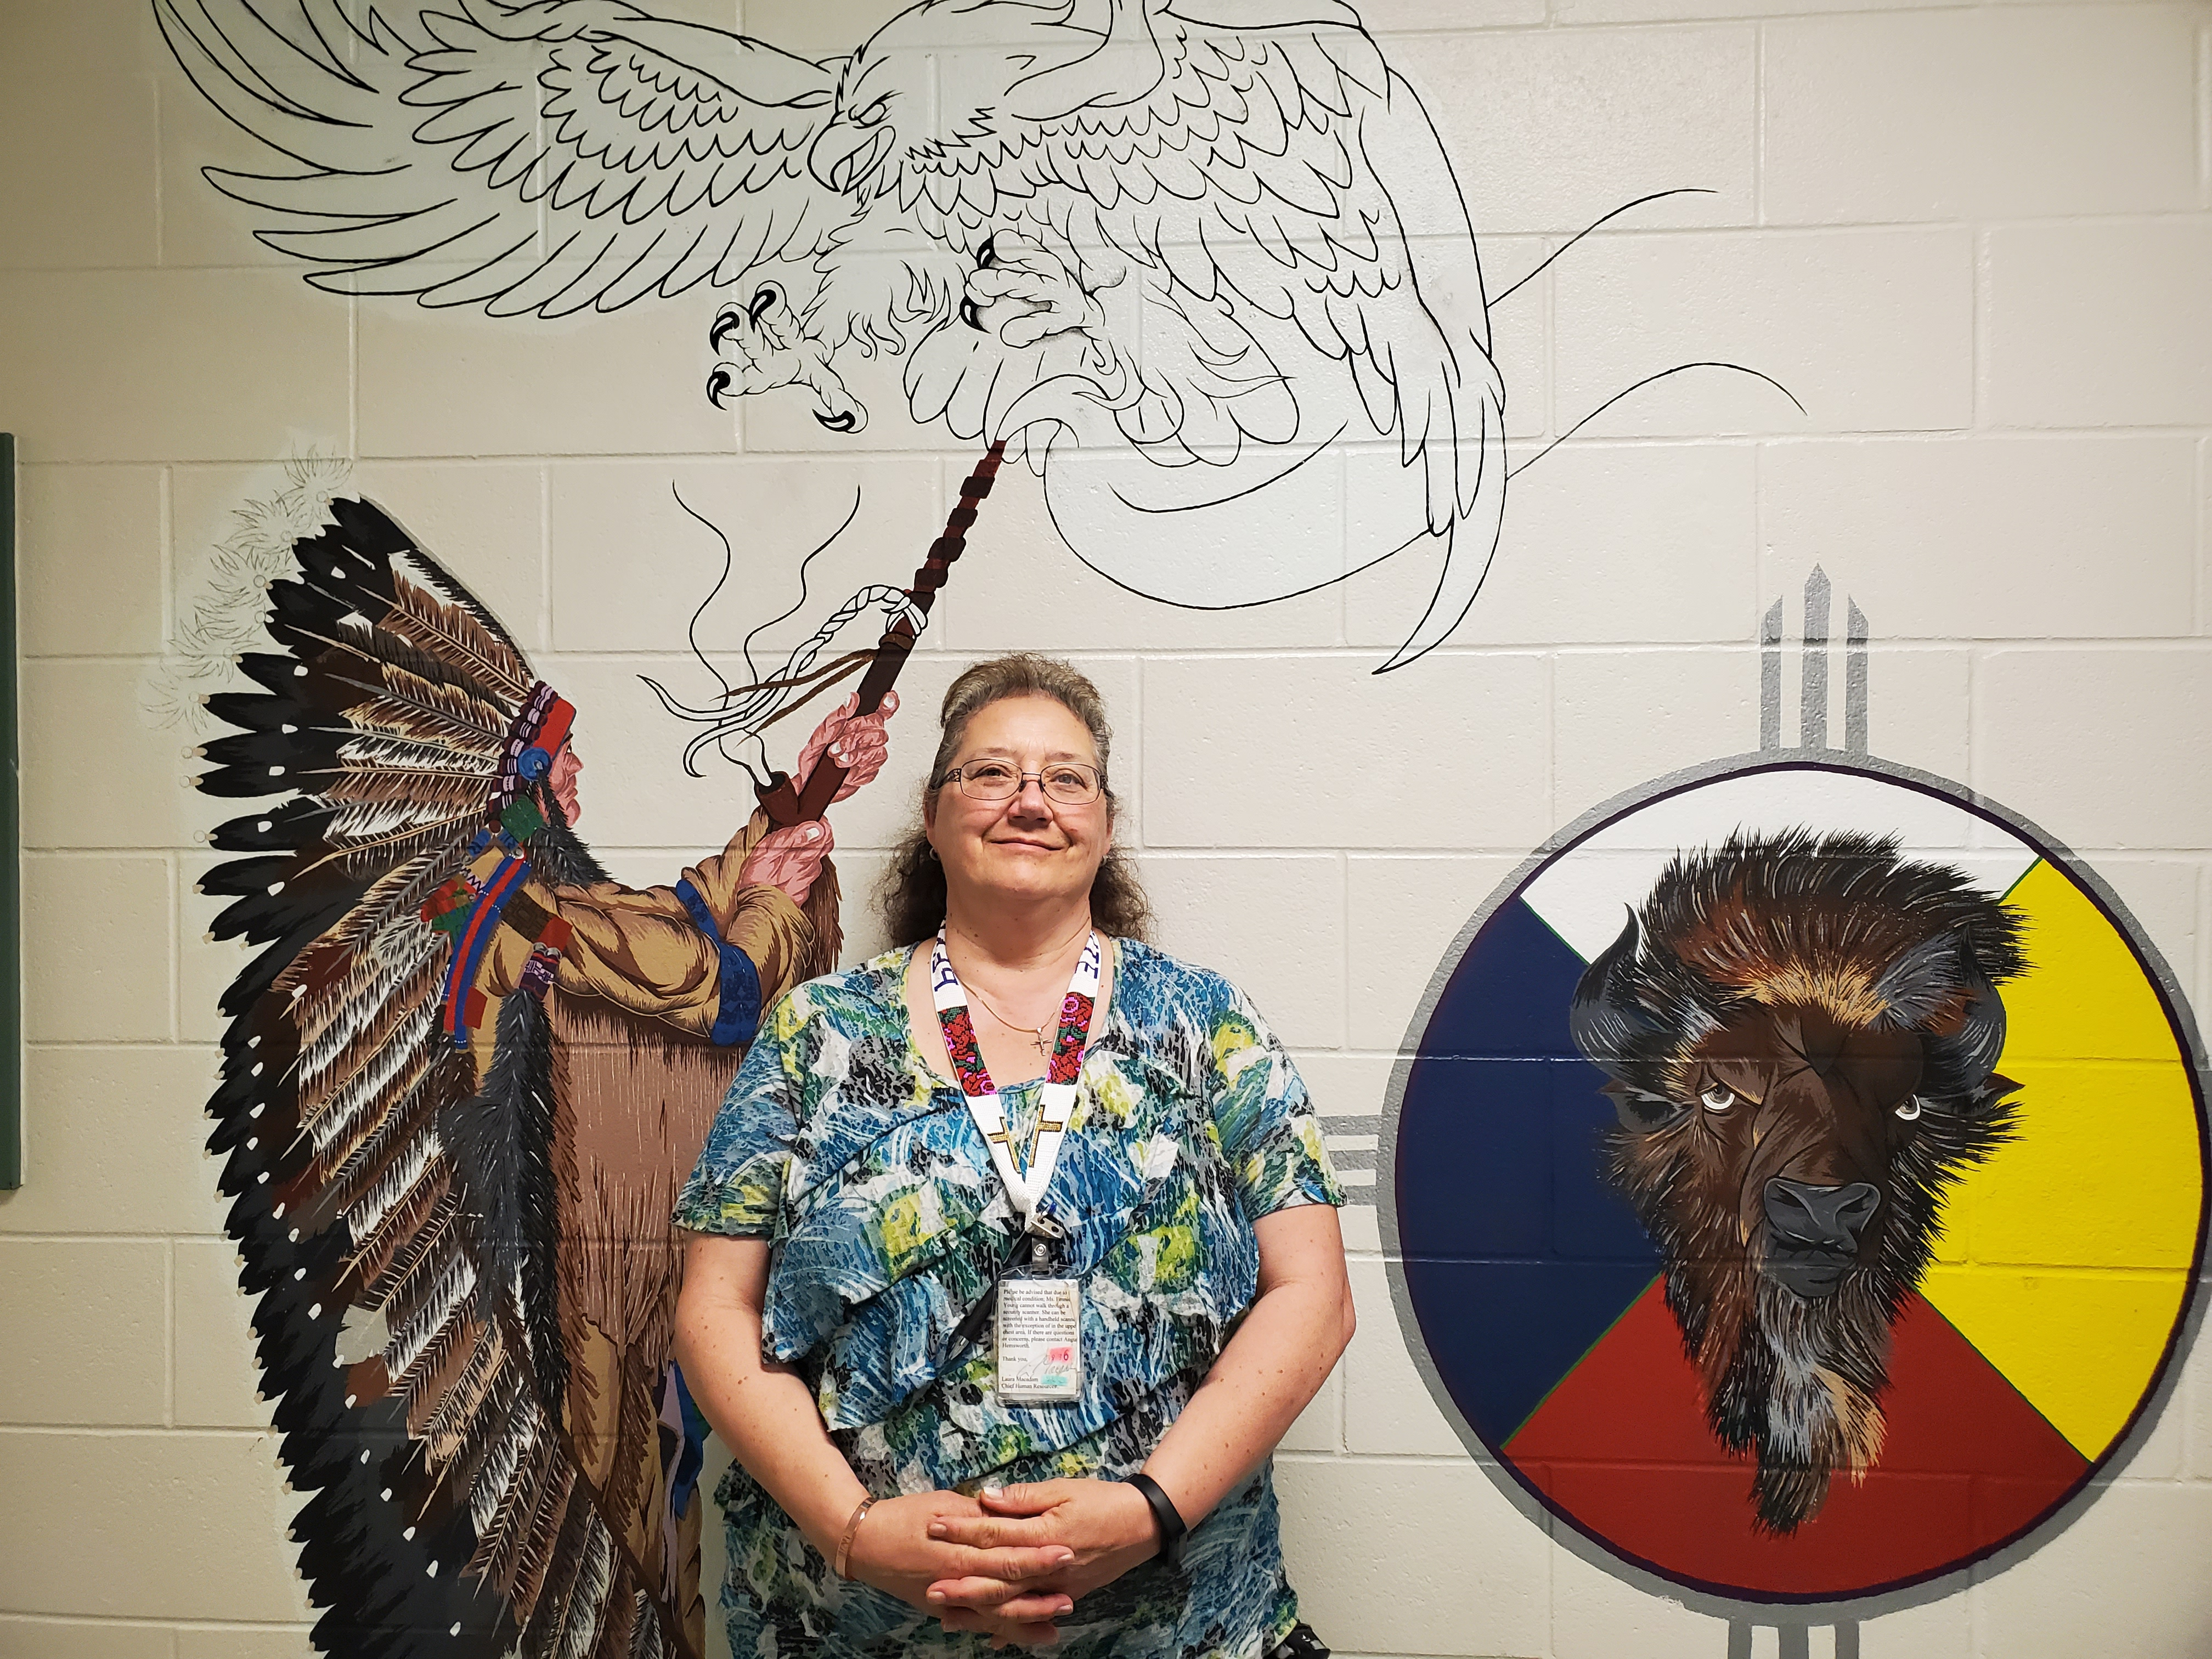 Pennie Young, Volunteer Coordinator at Saskatchewan Penitentiary in Prince Albert, Saskatchewan.